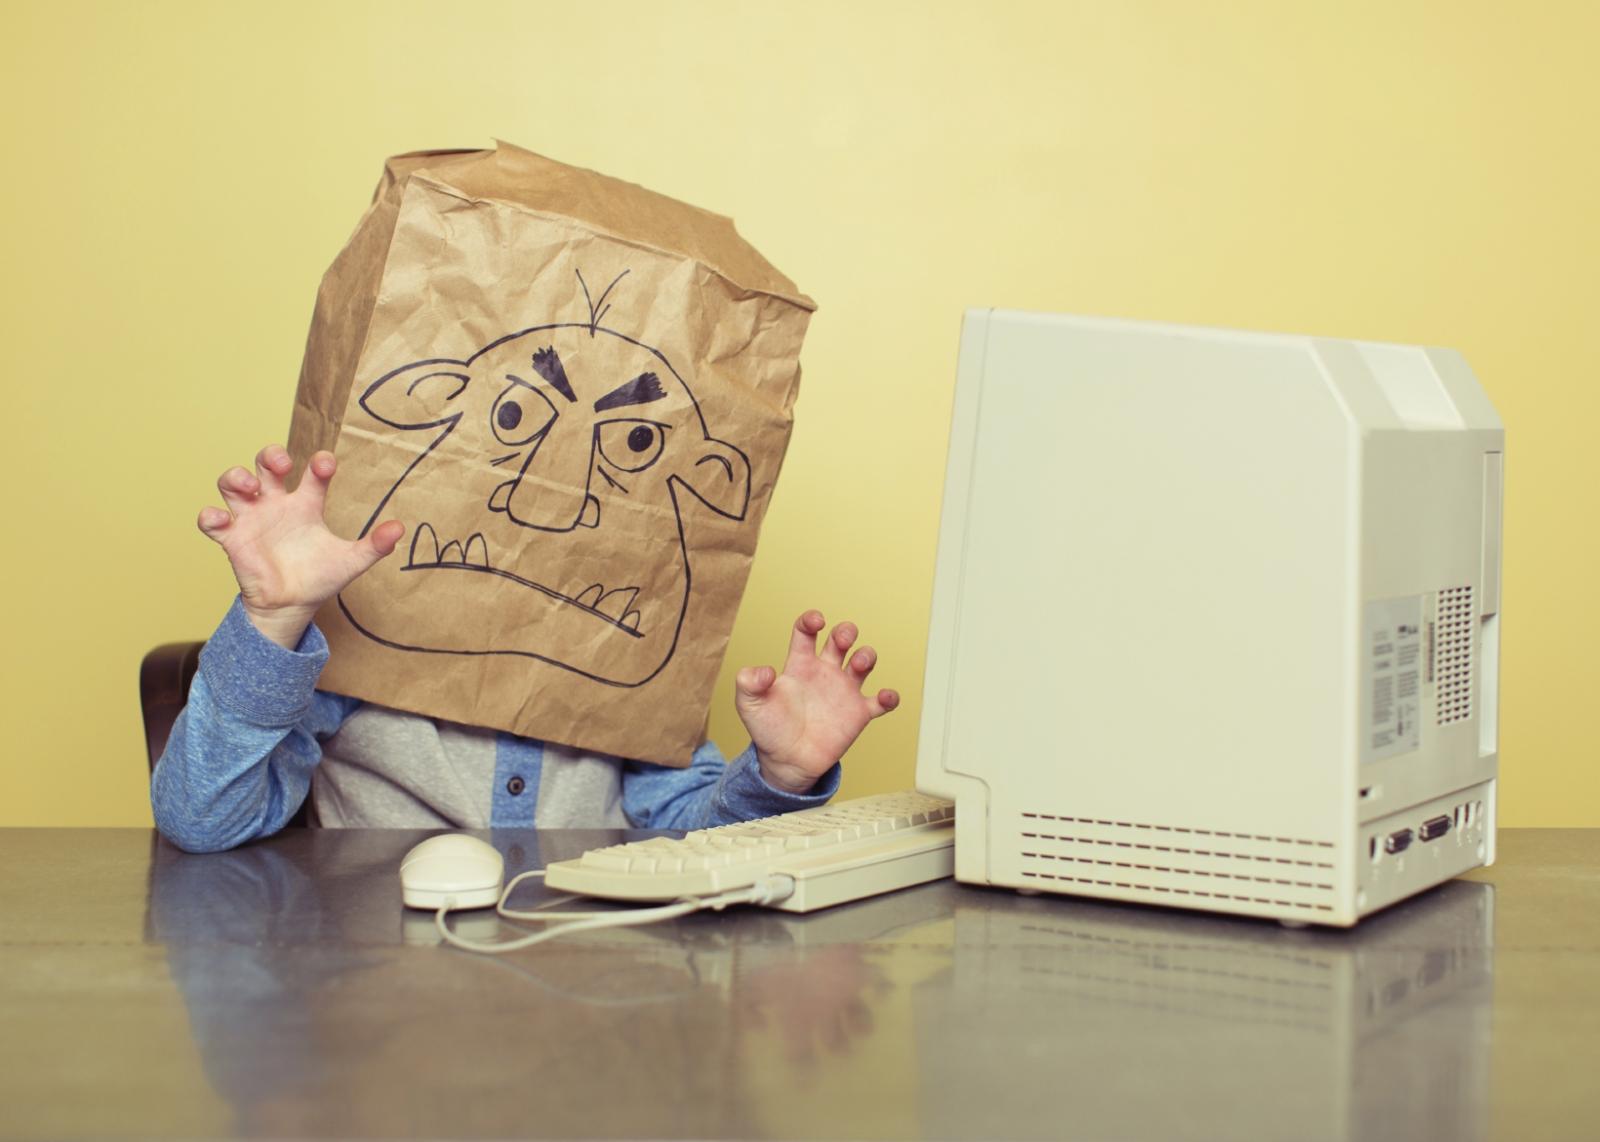 An internet troll